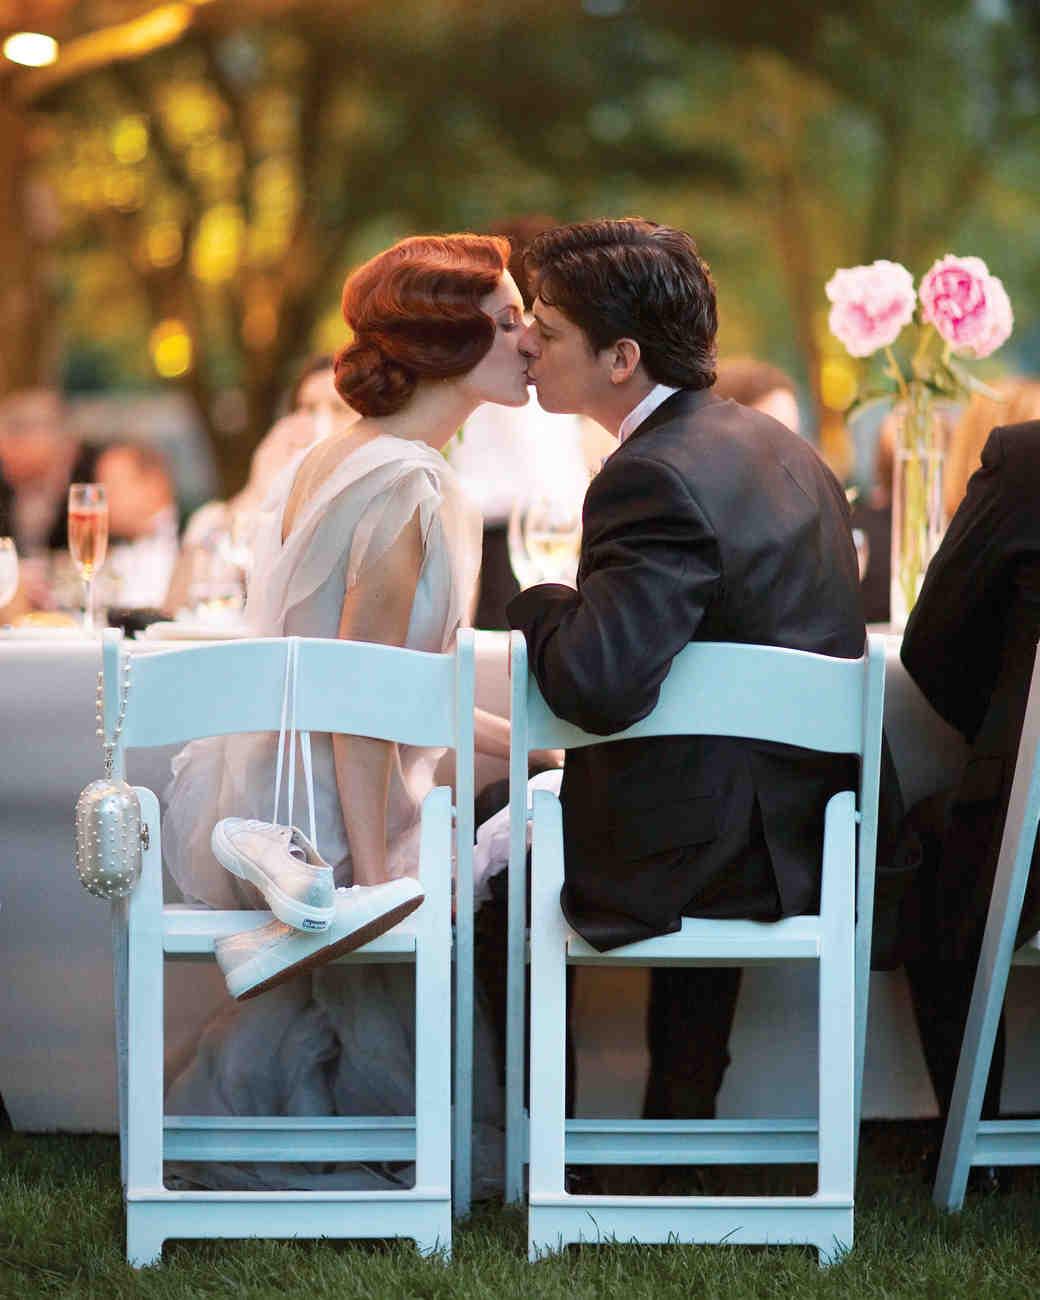 best-kisses-msw2169tomasi-0115.jpg